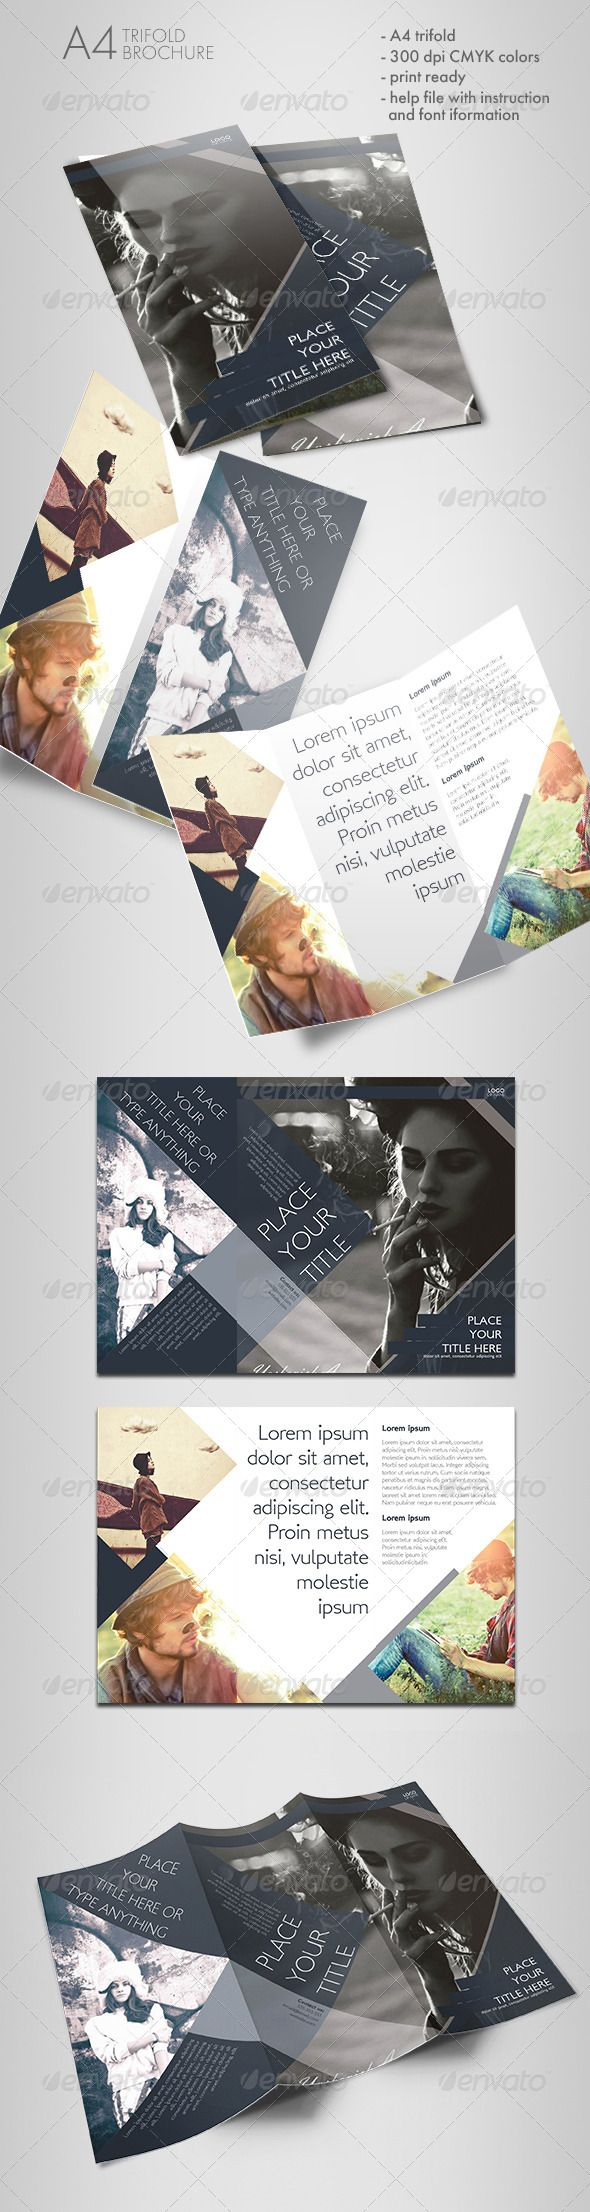 Printable Tri Fold Brochure Template Shaped Trifold Brochure  Brochures Brochure Template And Shapes